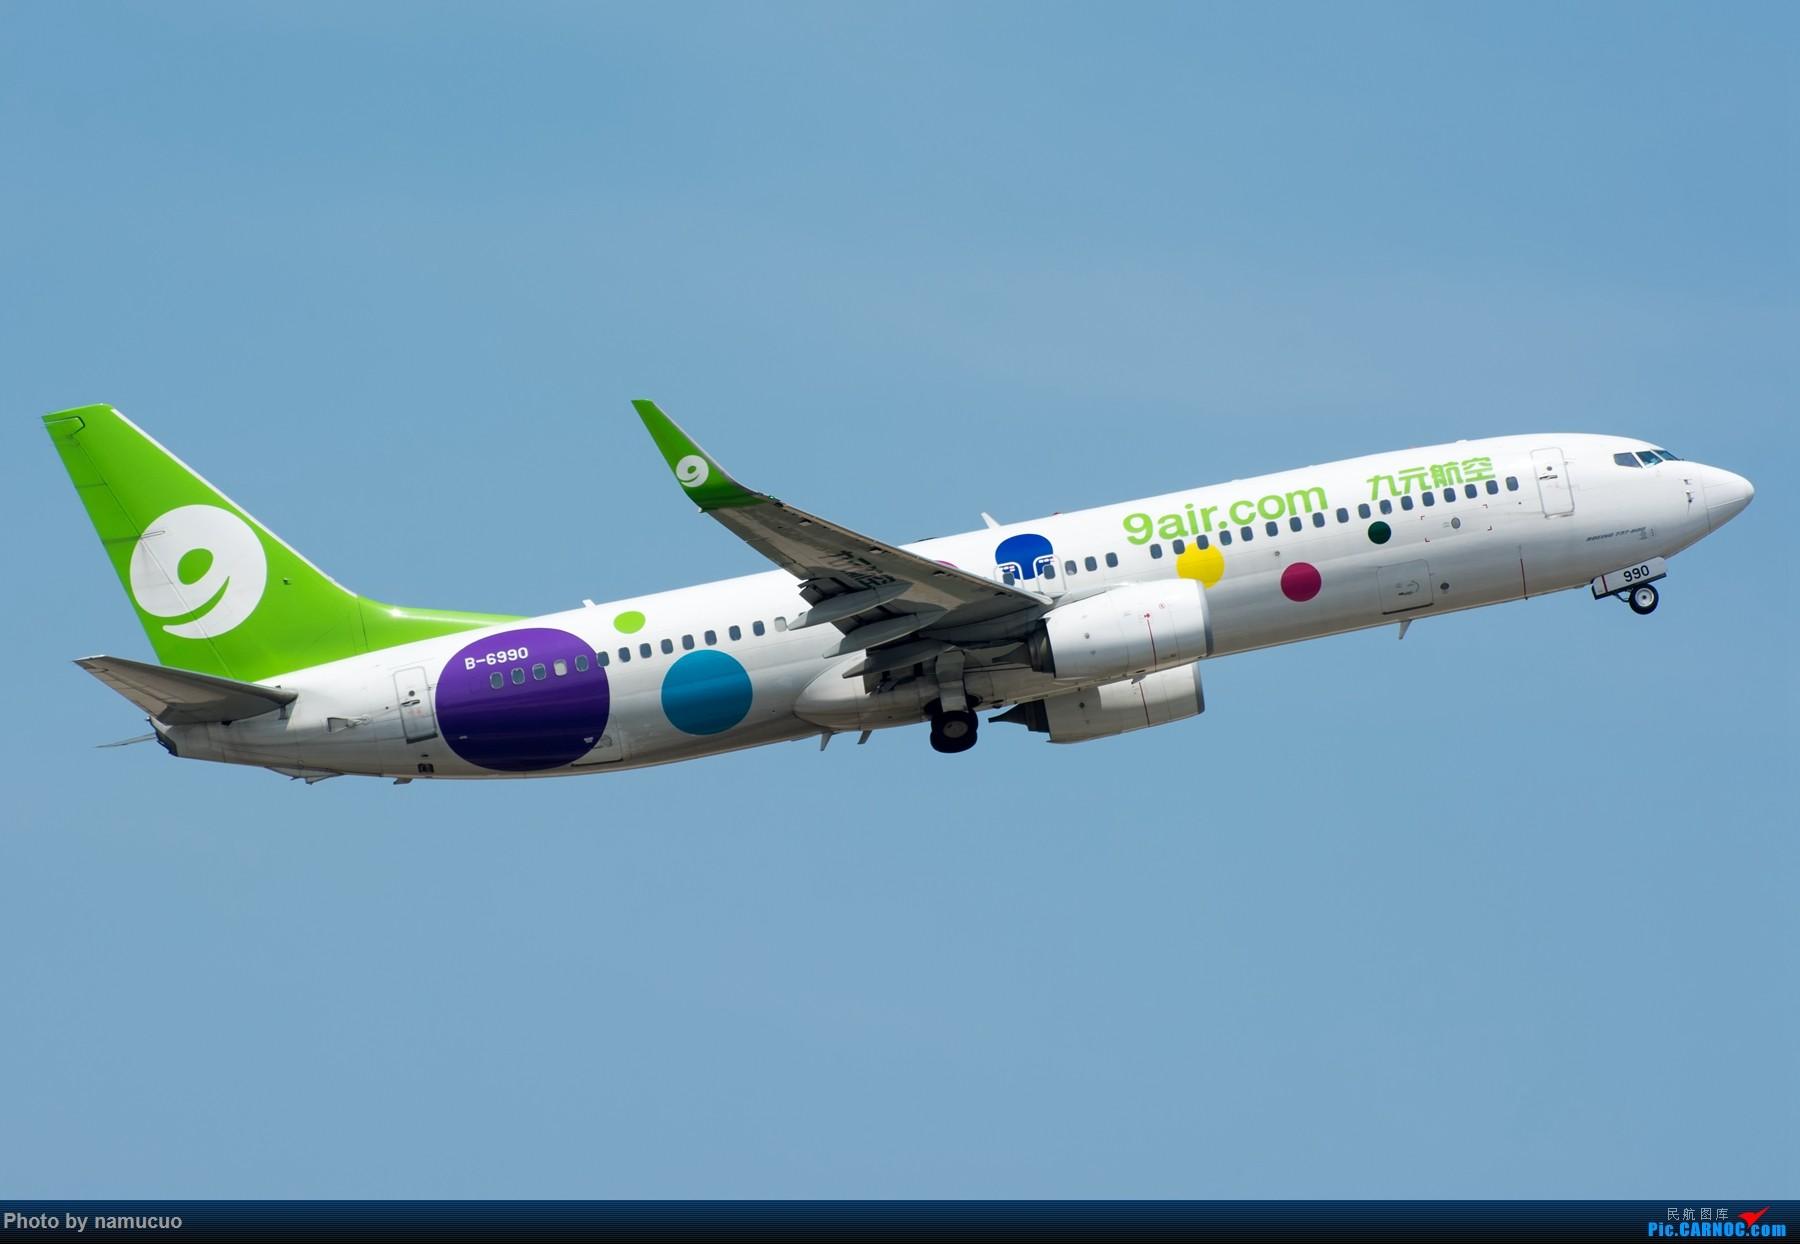 【TSN】九元航空738拉起收轮 BOEING 737-800 B-6990